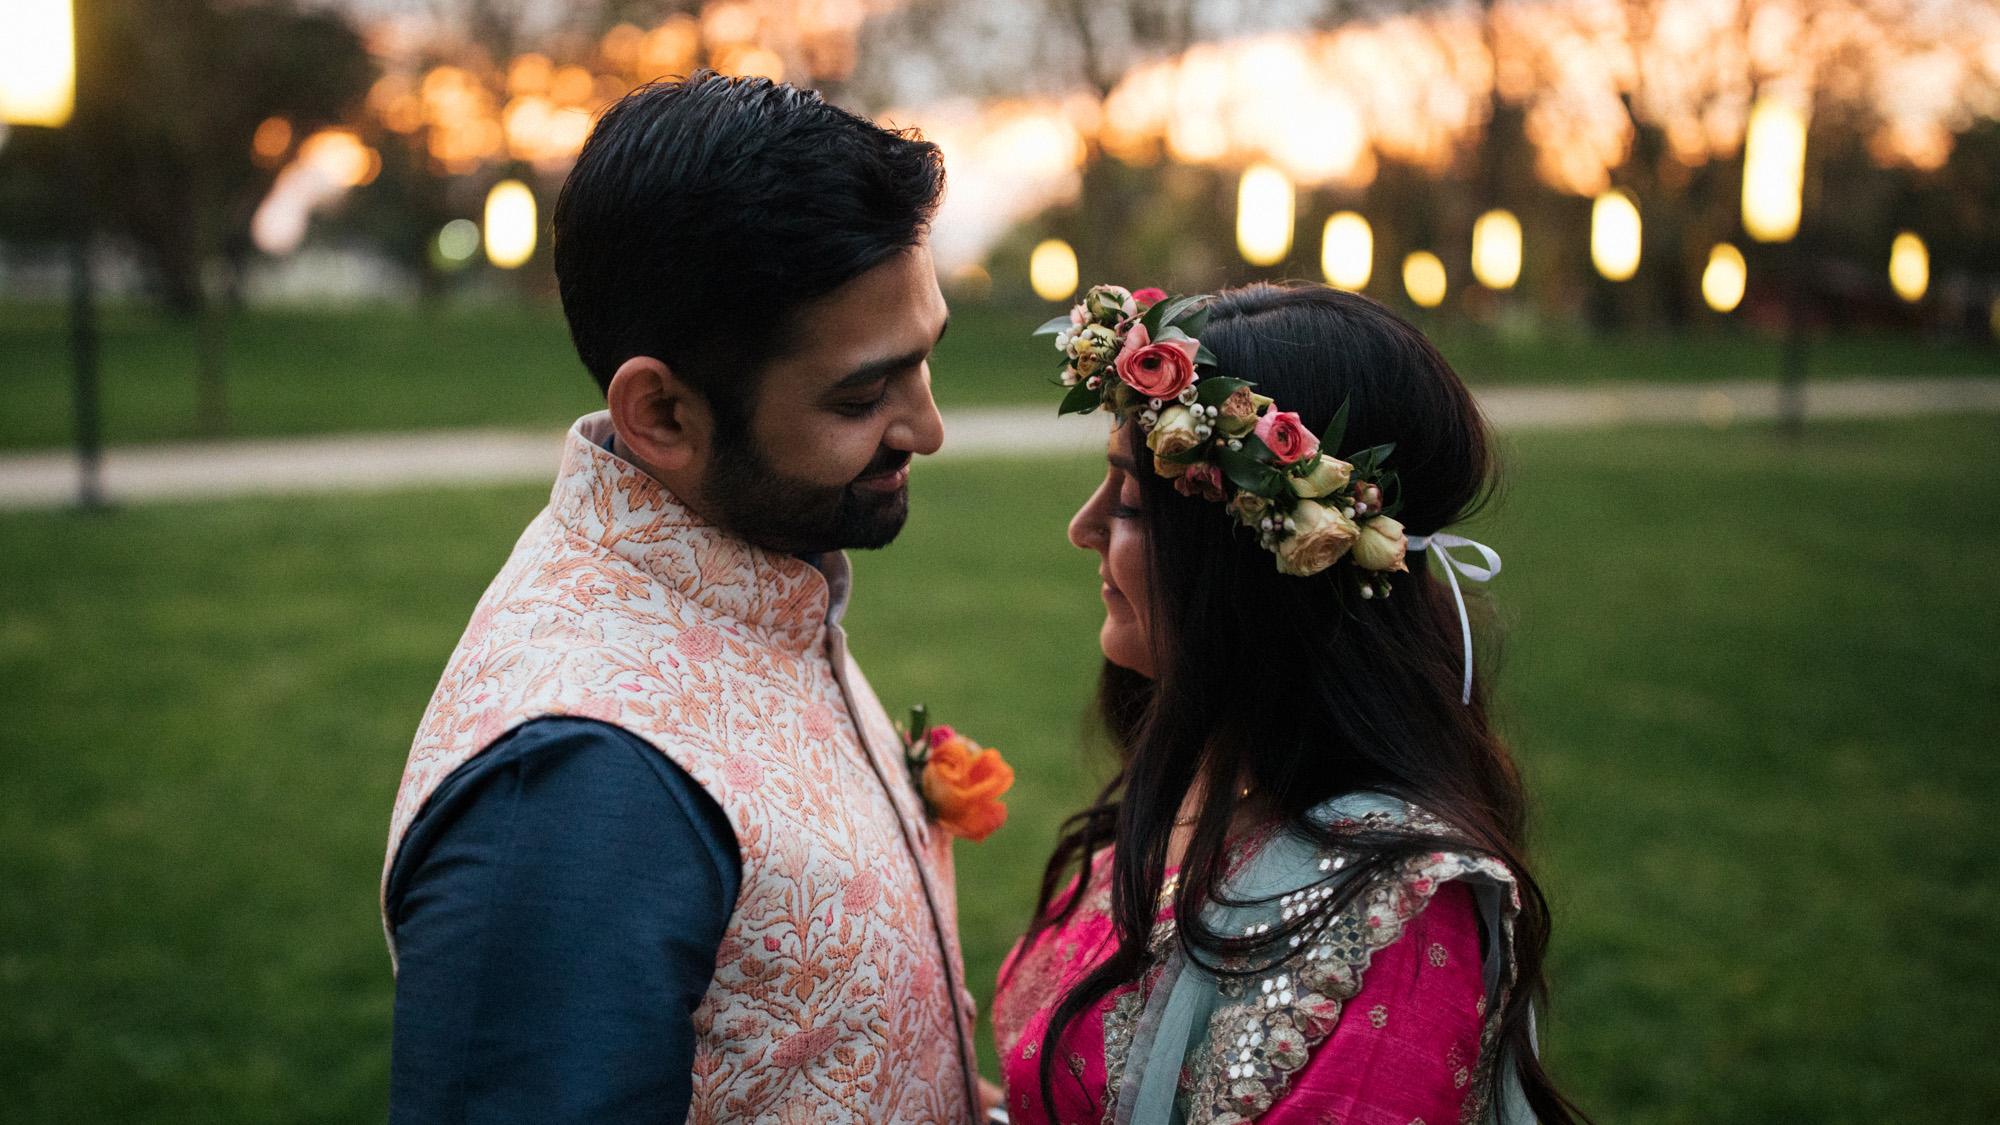 anu_maneesh_alec_vanderboom_Indian_wedding_photography-0028.jpg